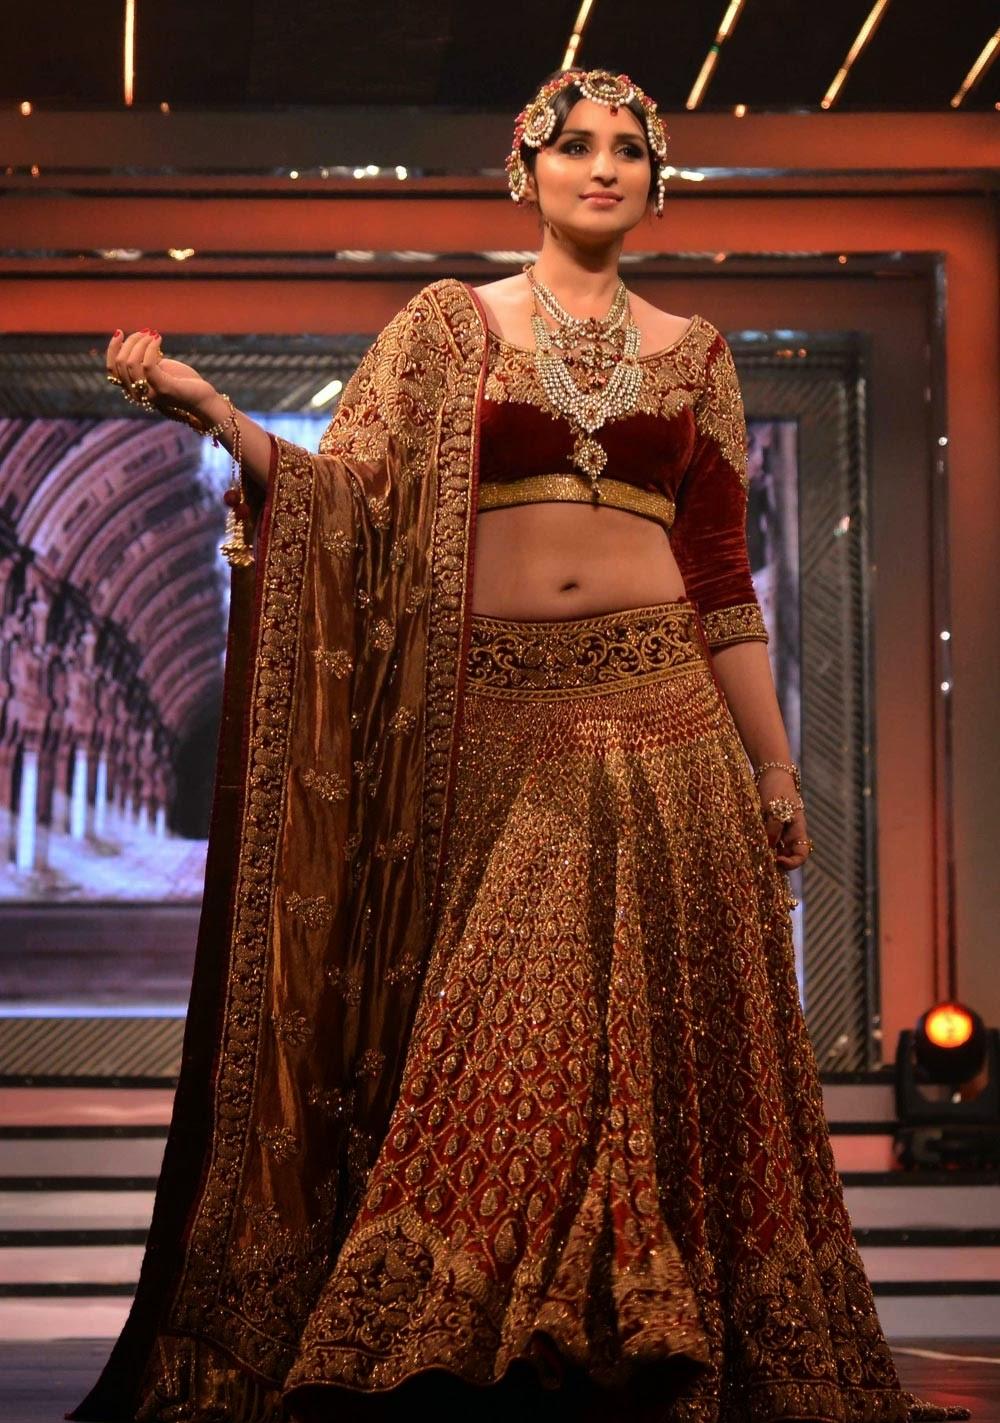 696439a183 Buy Bollywood Celebrity Designer Replicas Suits | Sarees | Lehengas